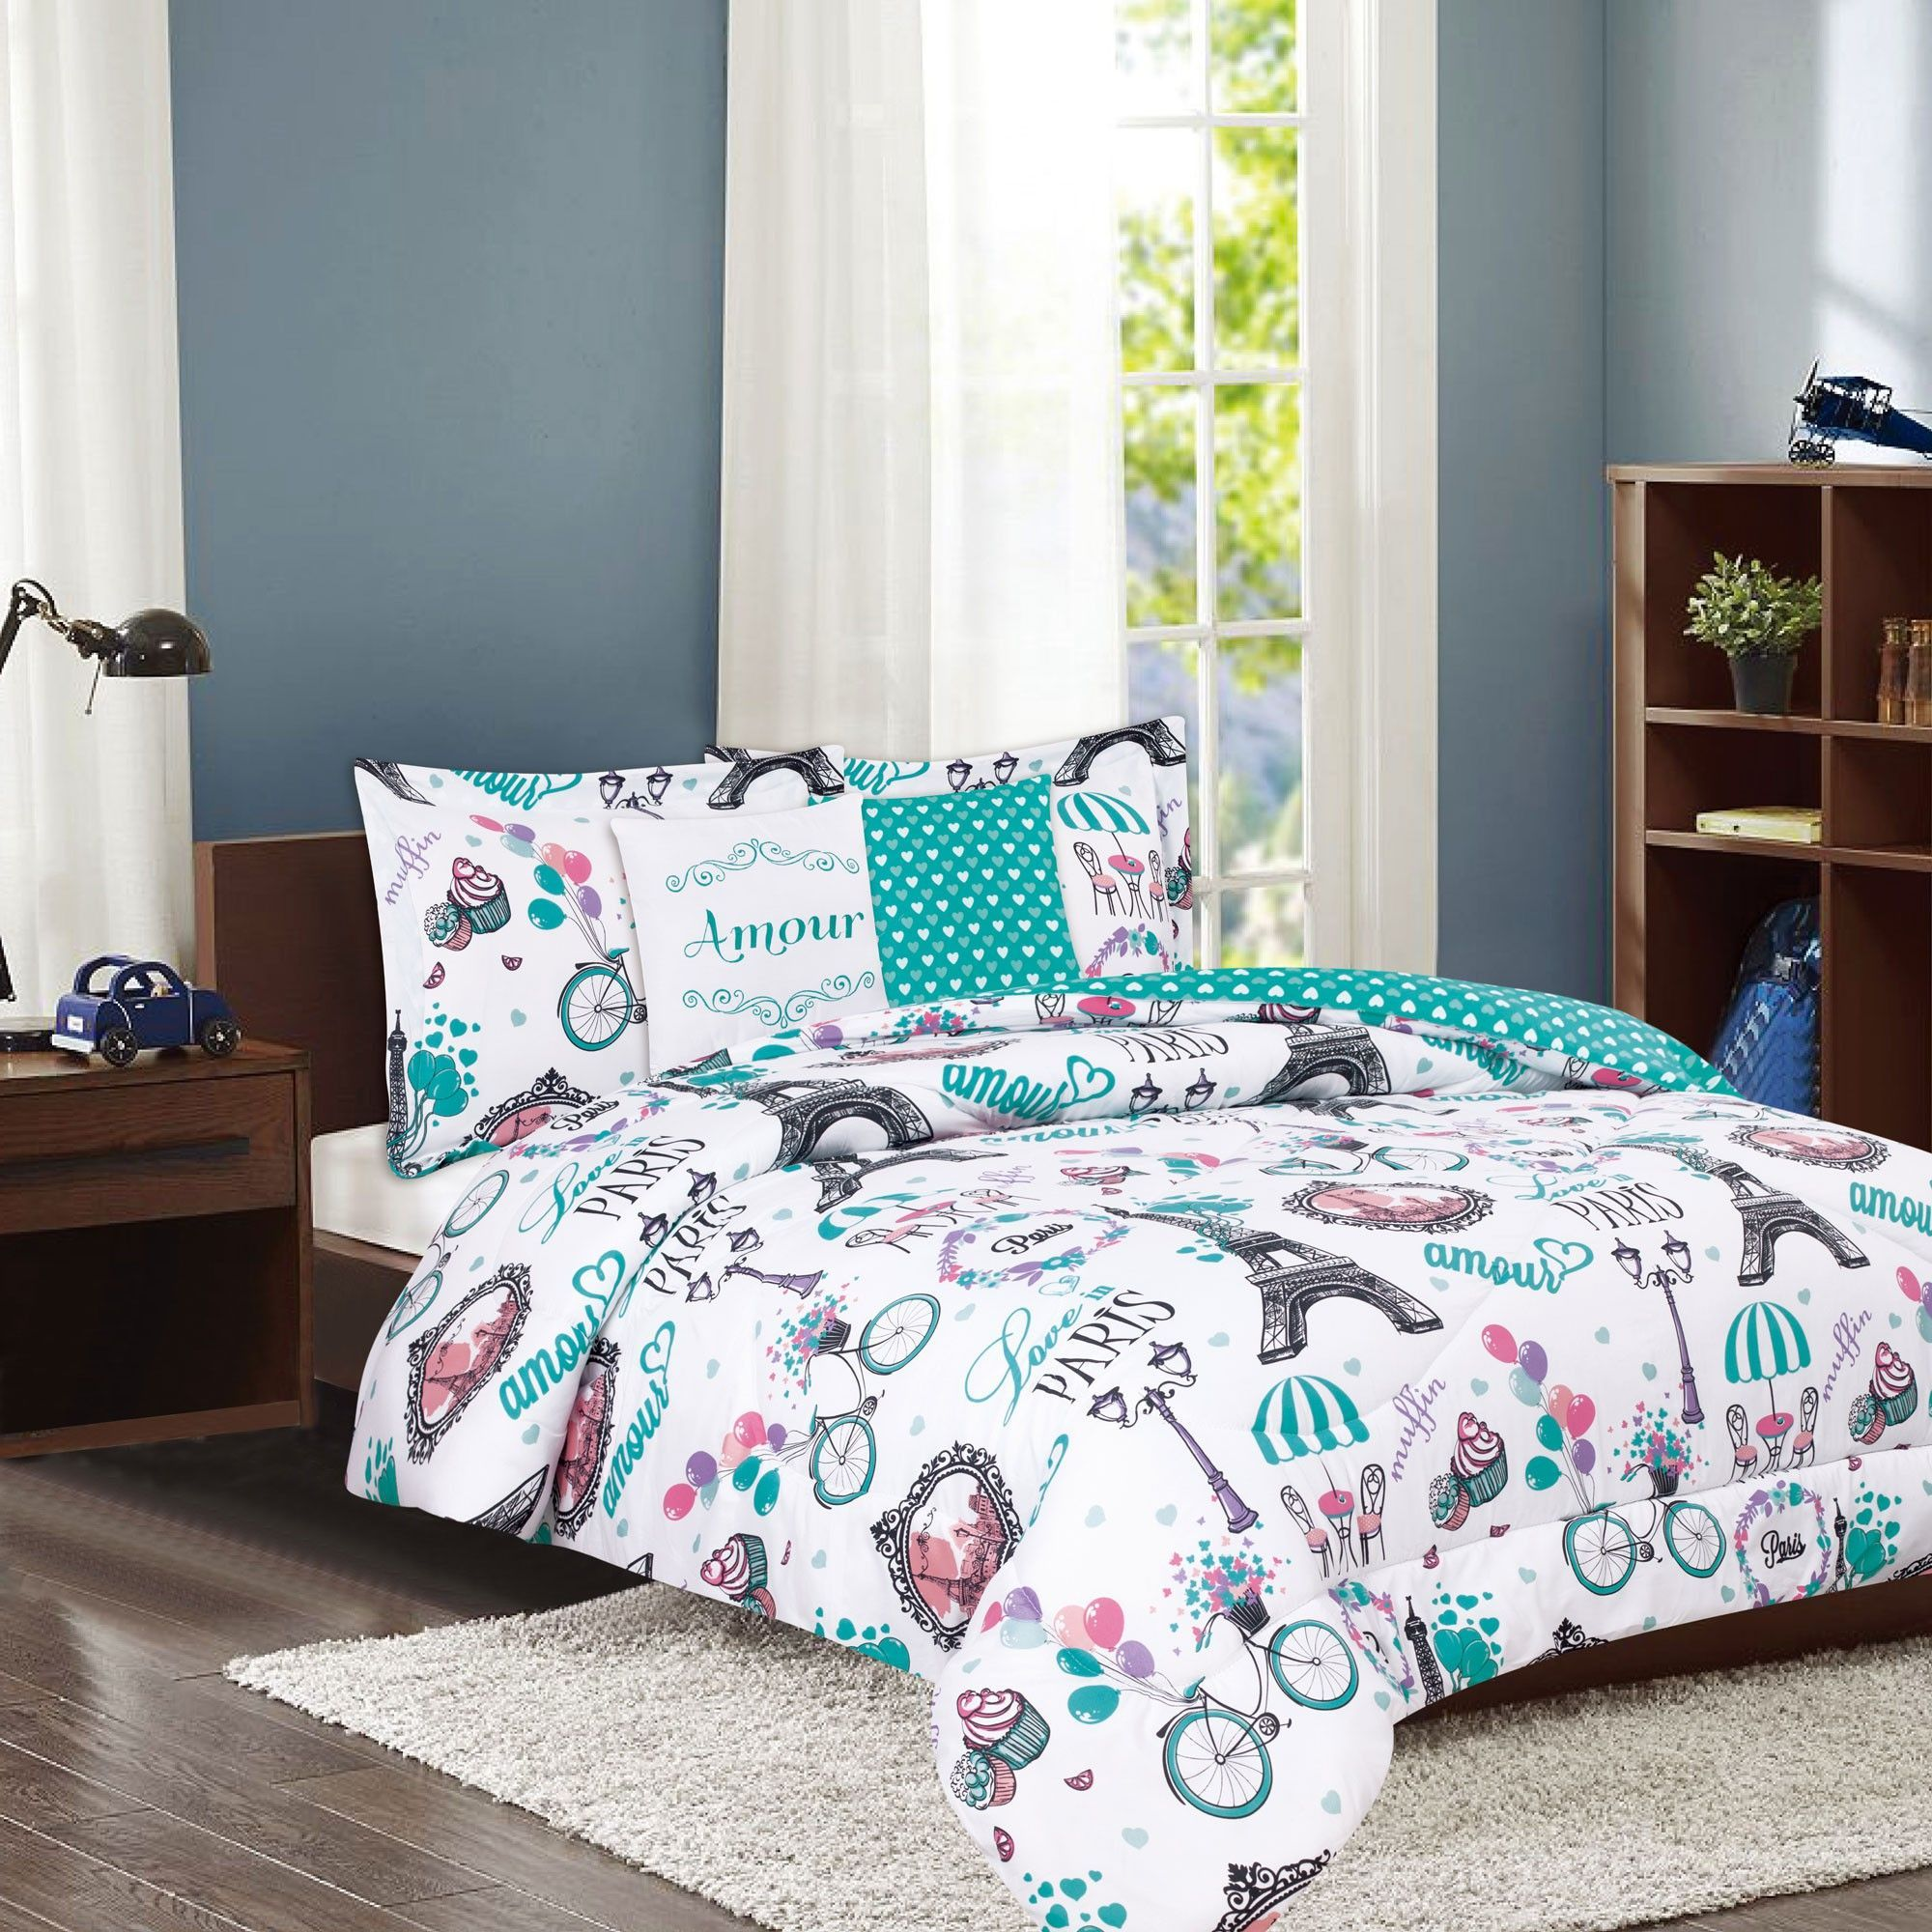 Crest Home Amour Full/Queen Paris Comforter 5 Piece